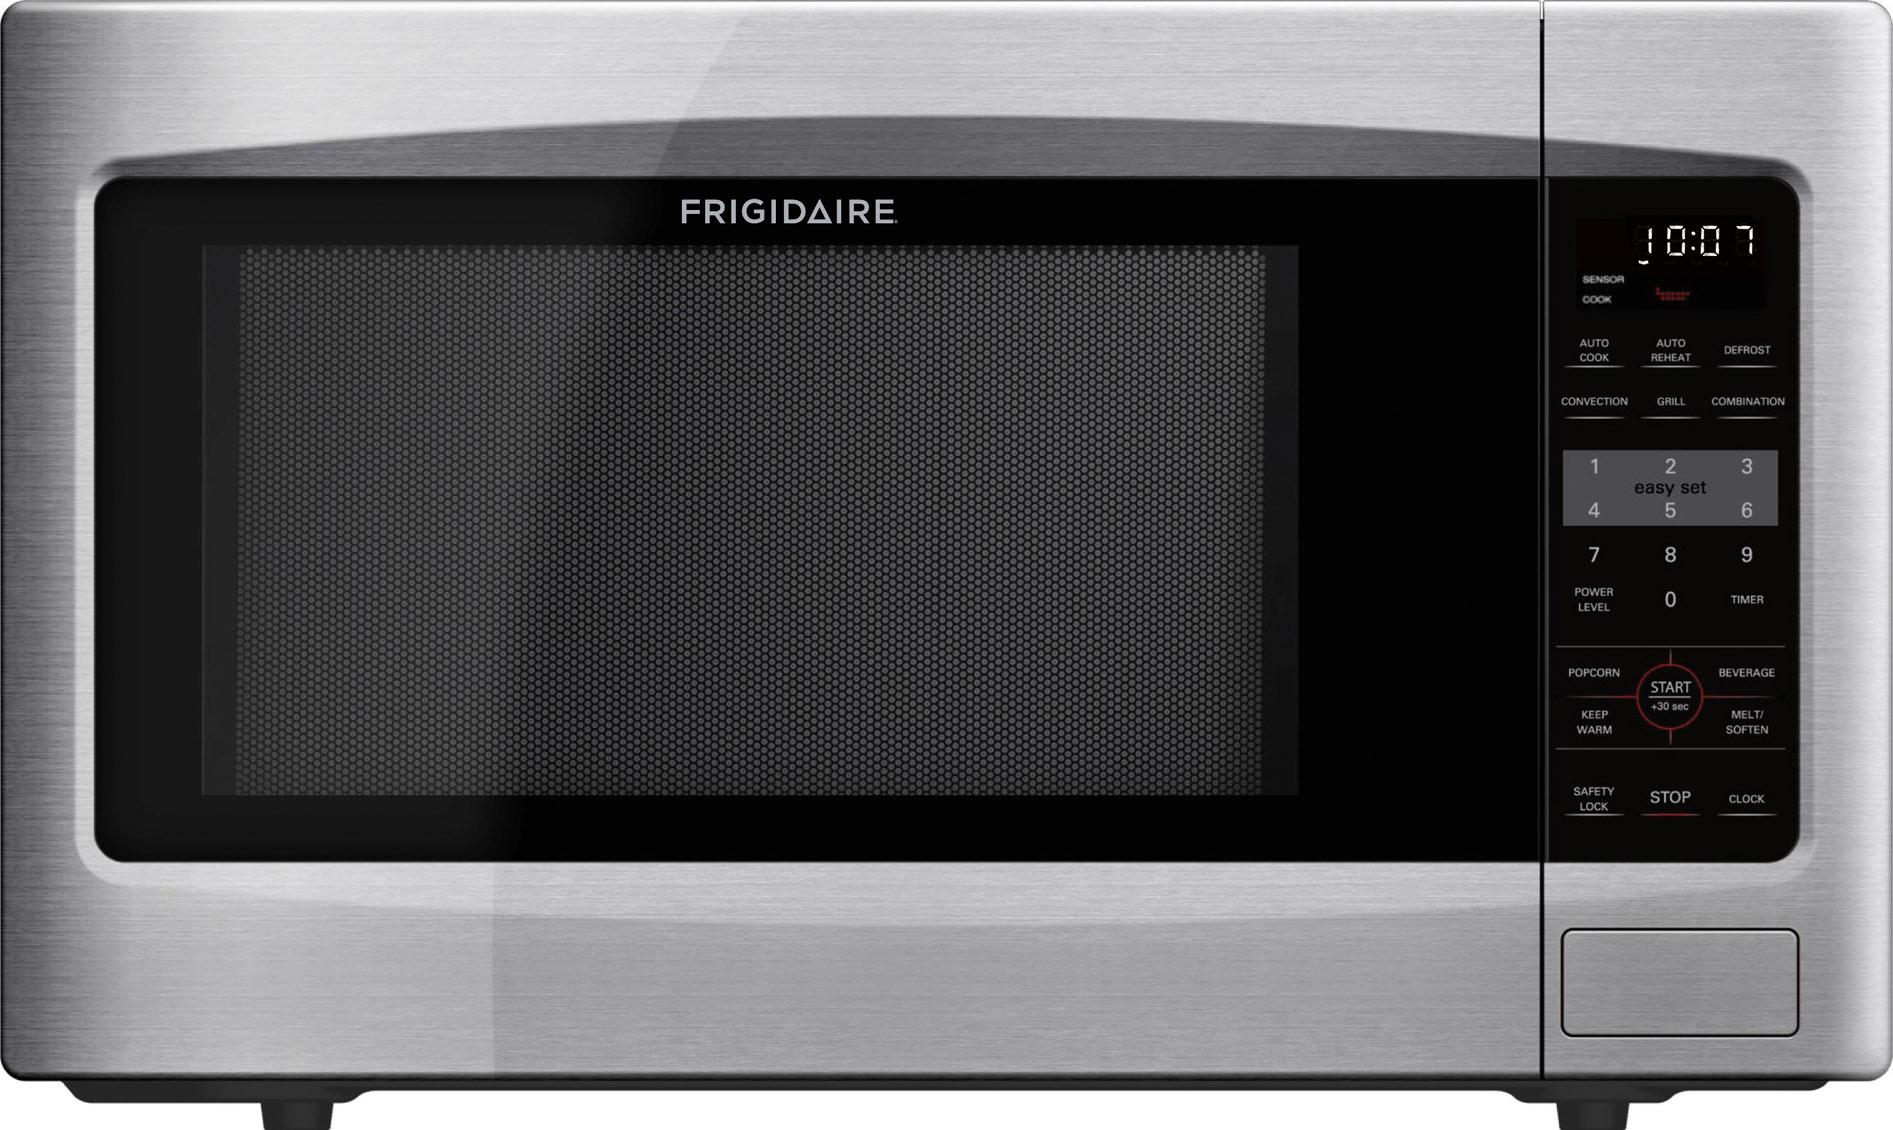 Frigidaire Microwave Model FFCT1278LS Parts